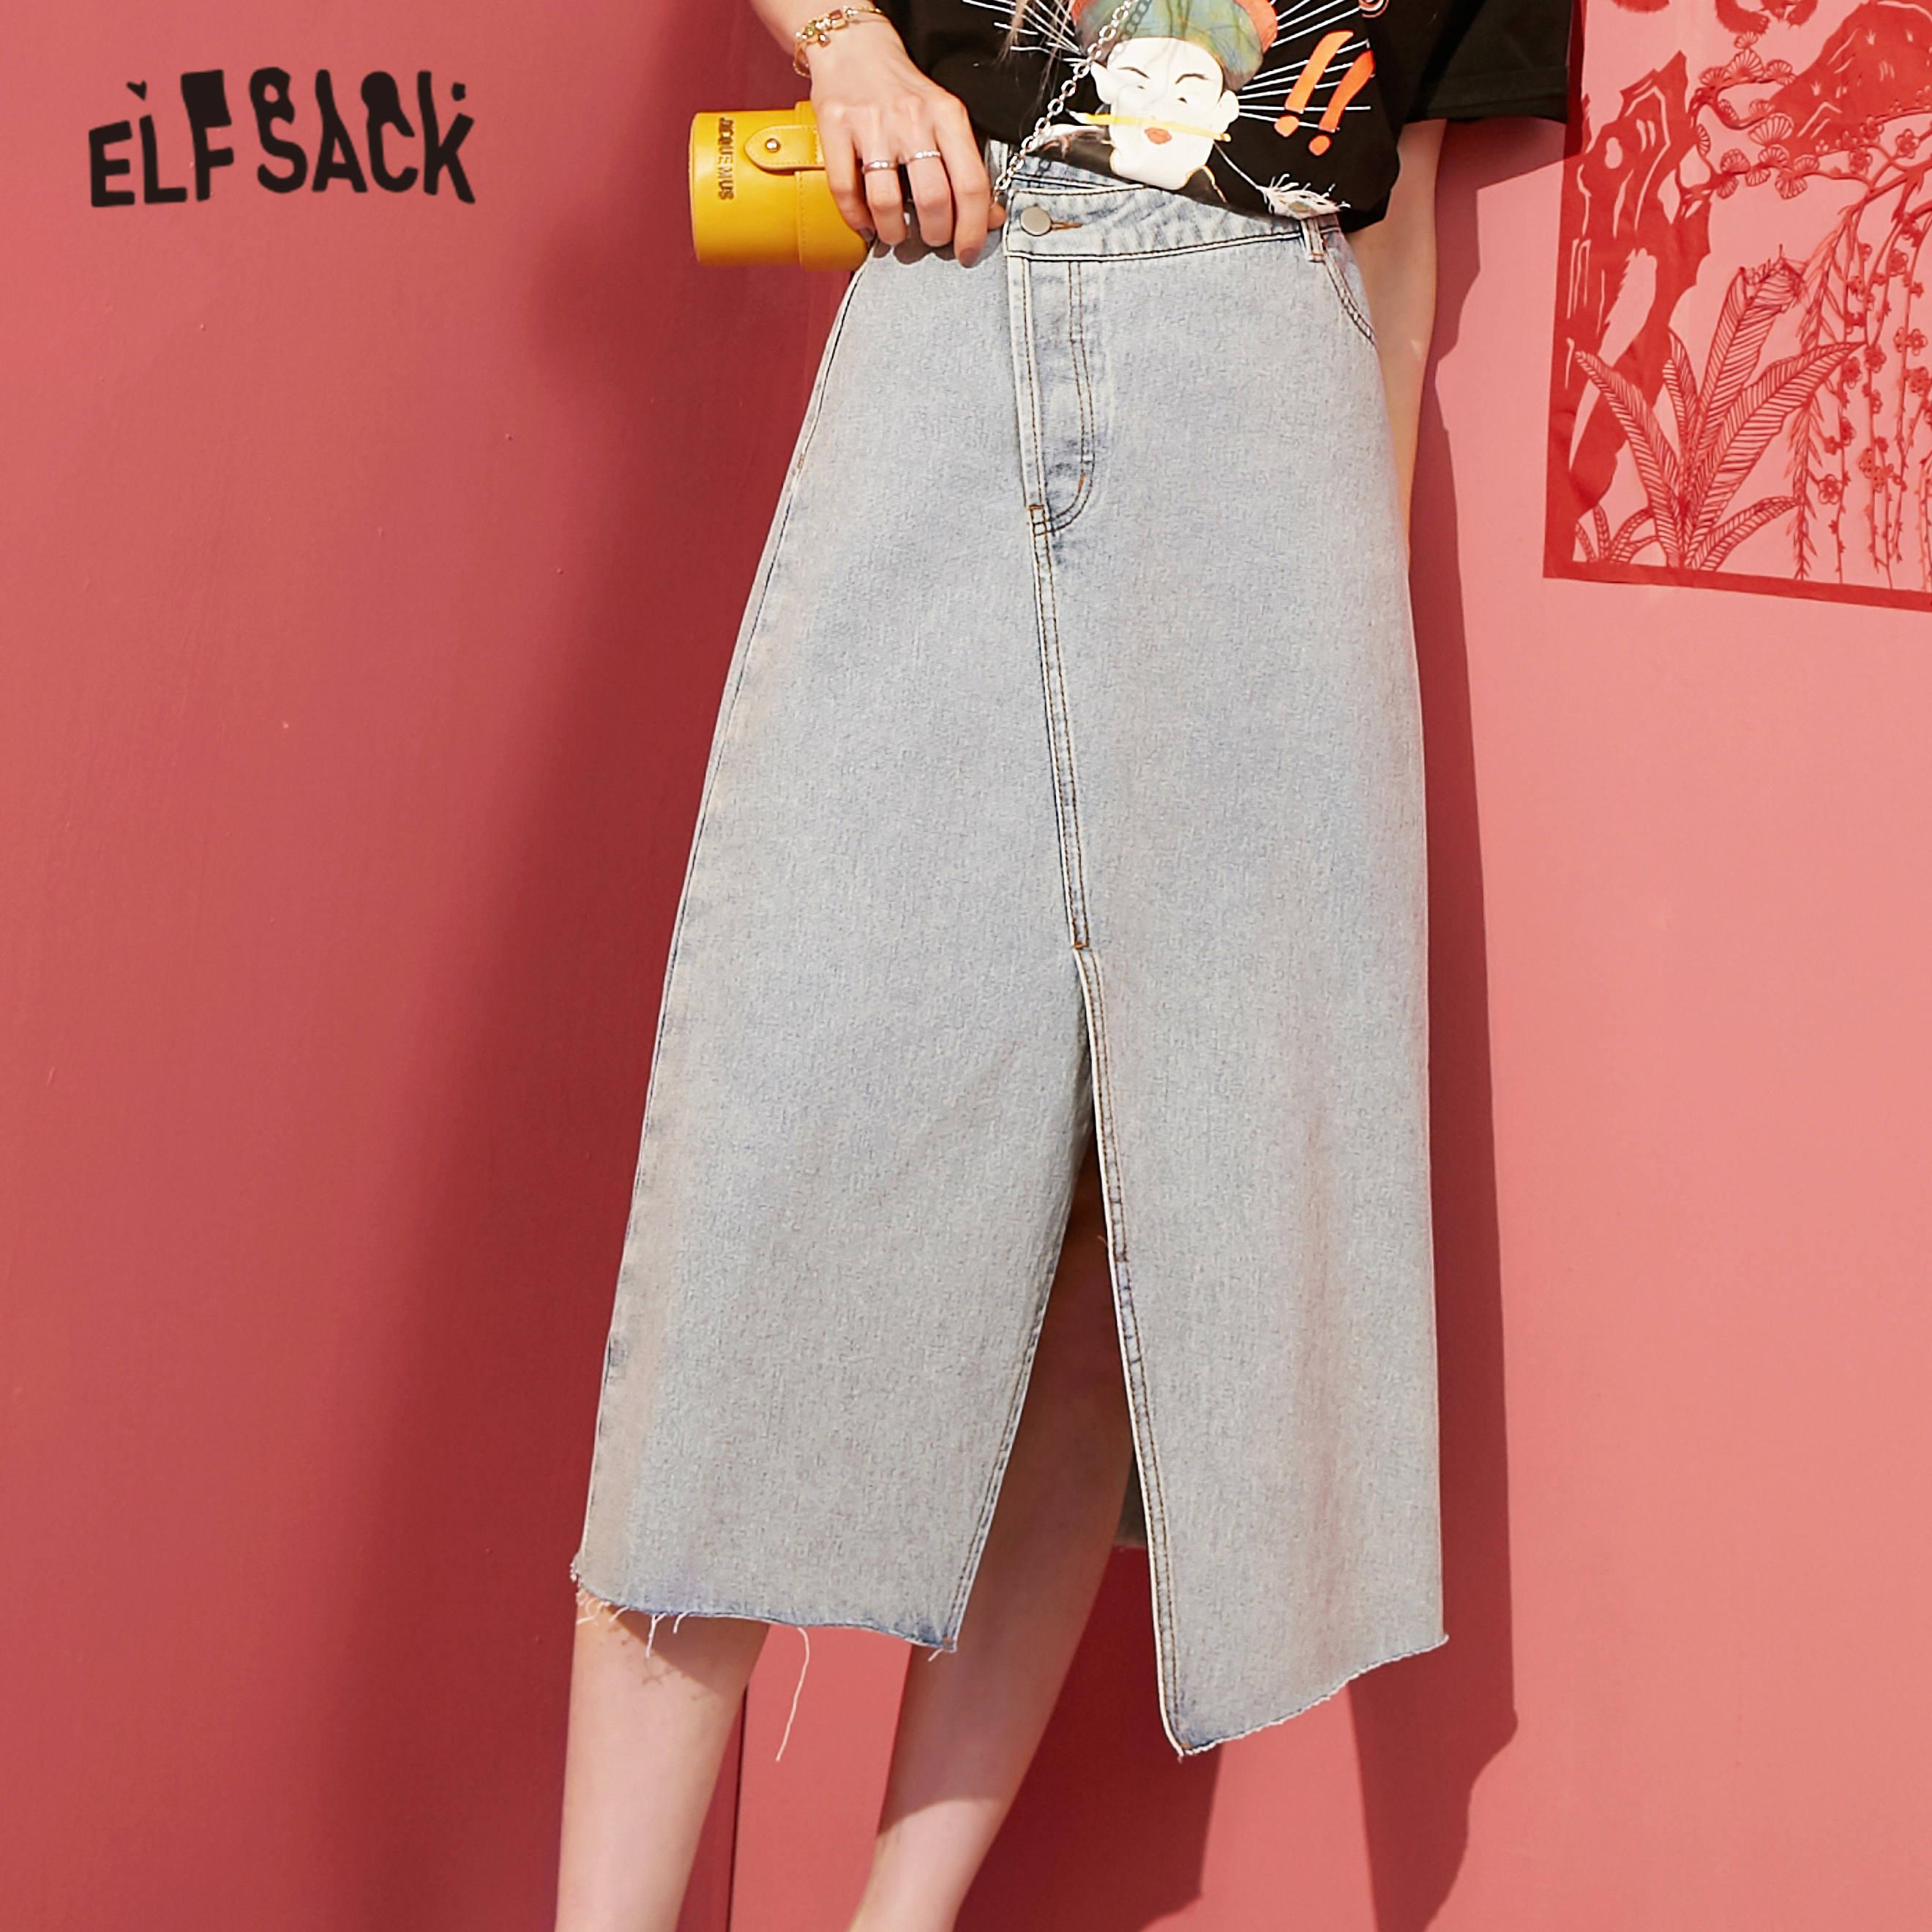 ELFSACK Blue Solid Irregular Hem Casual Women Long Skirts 2020 Spring New Elegant High Waist Korean Ladies Daily Denim Skirt